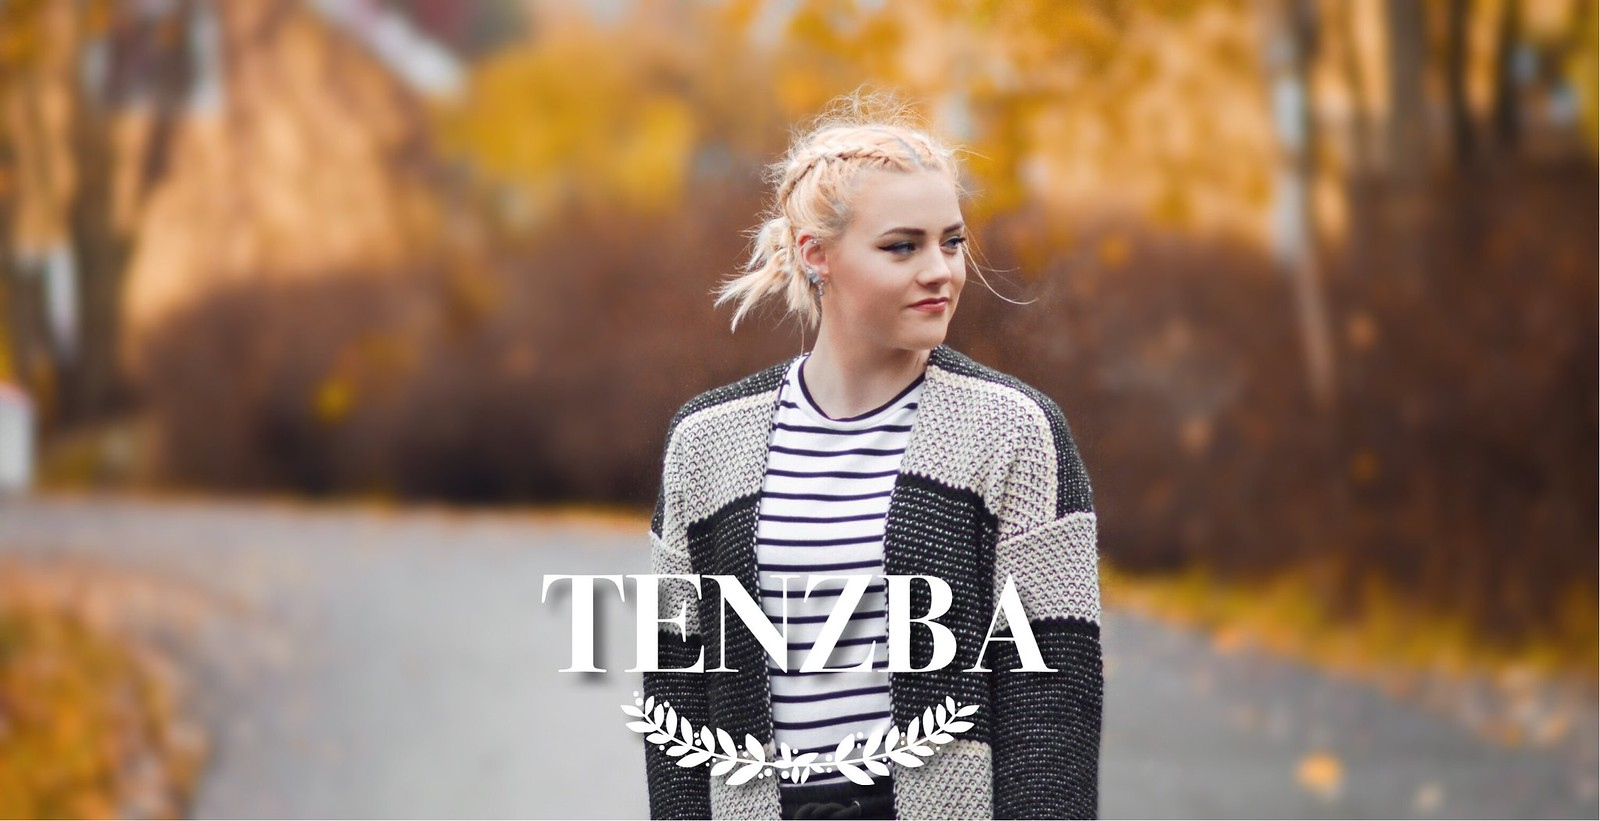 TENZBA